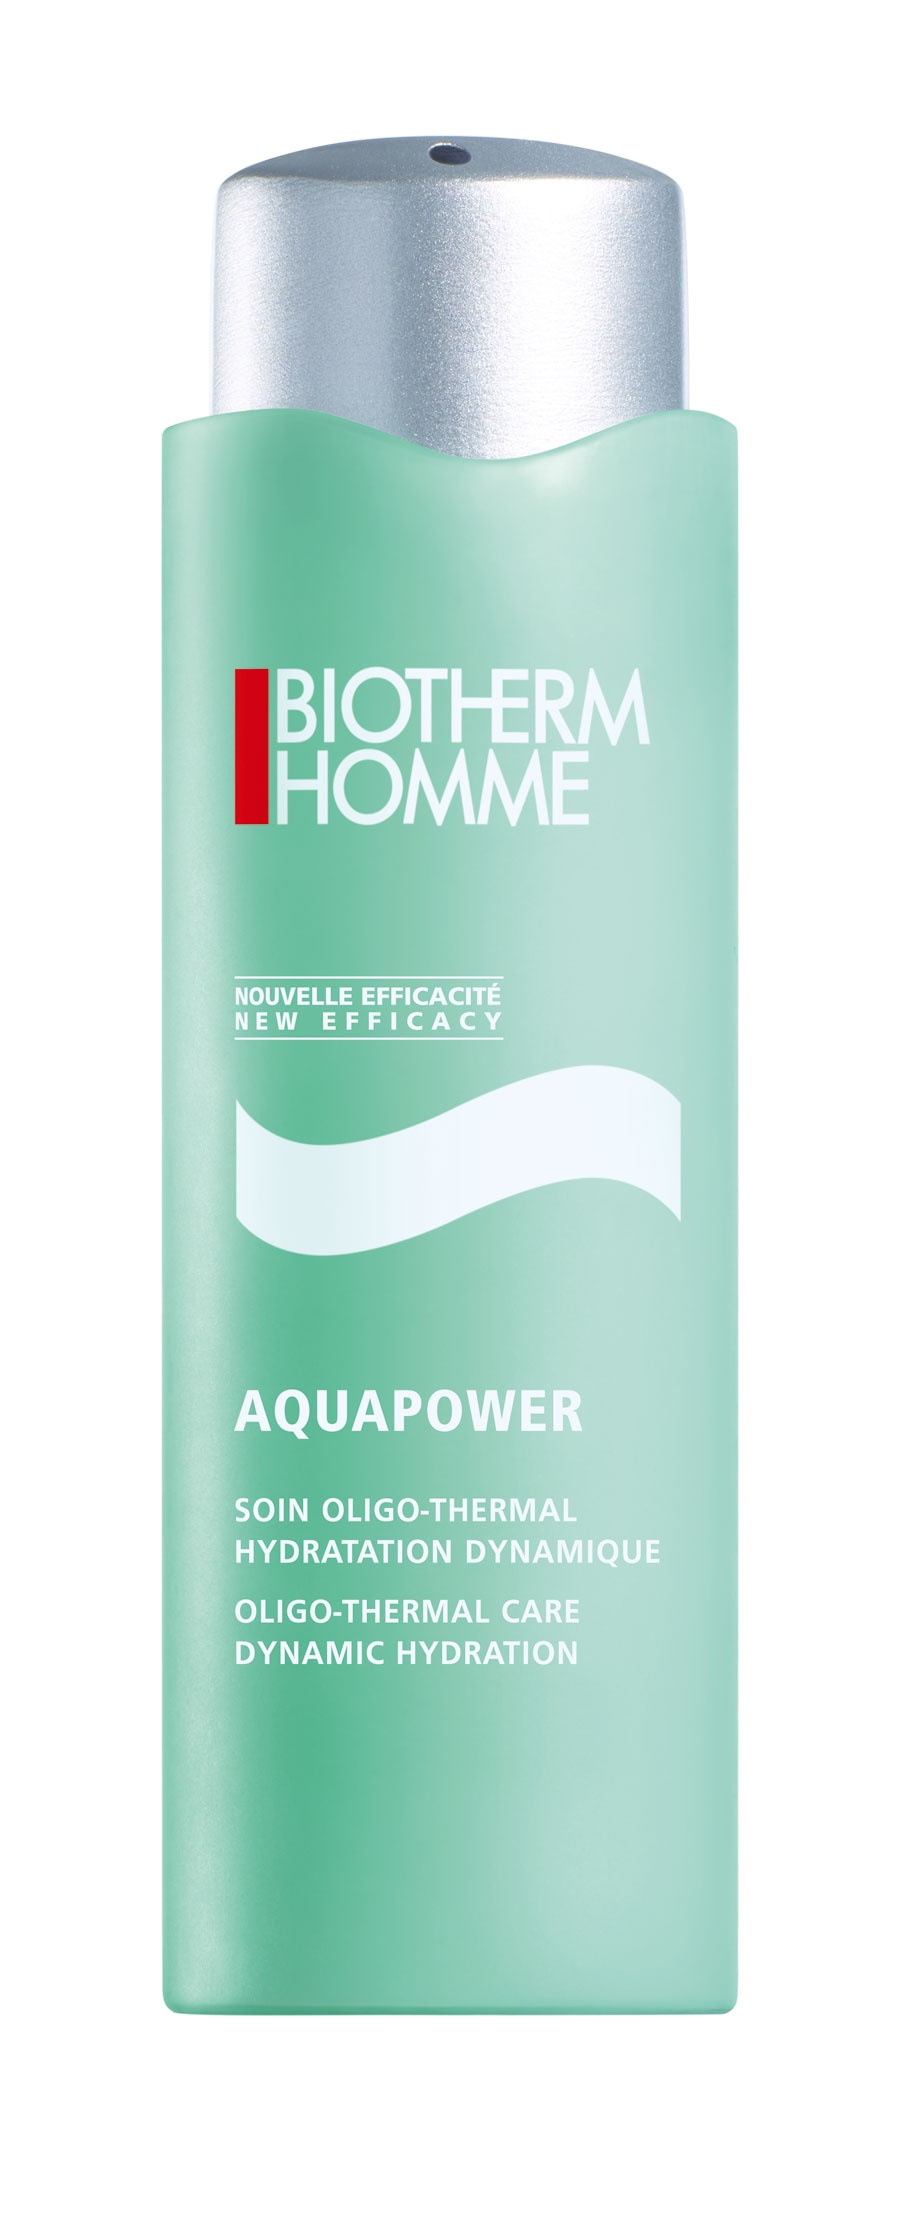 Biotherm Homme Aquapower Gel, 75 ml